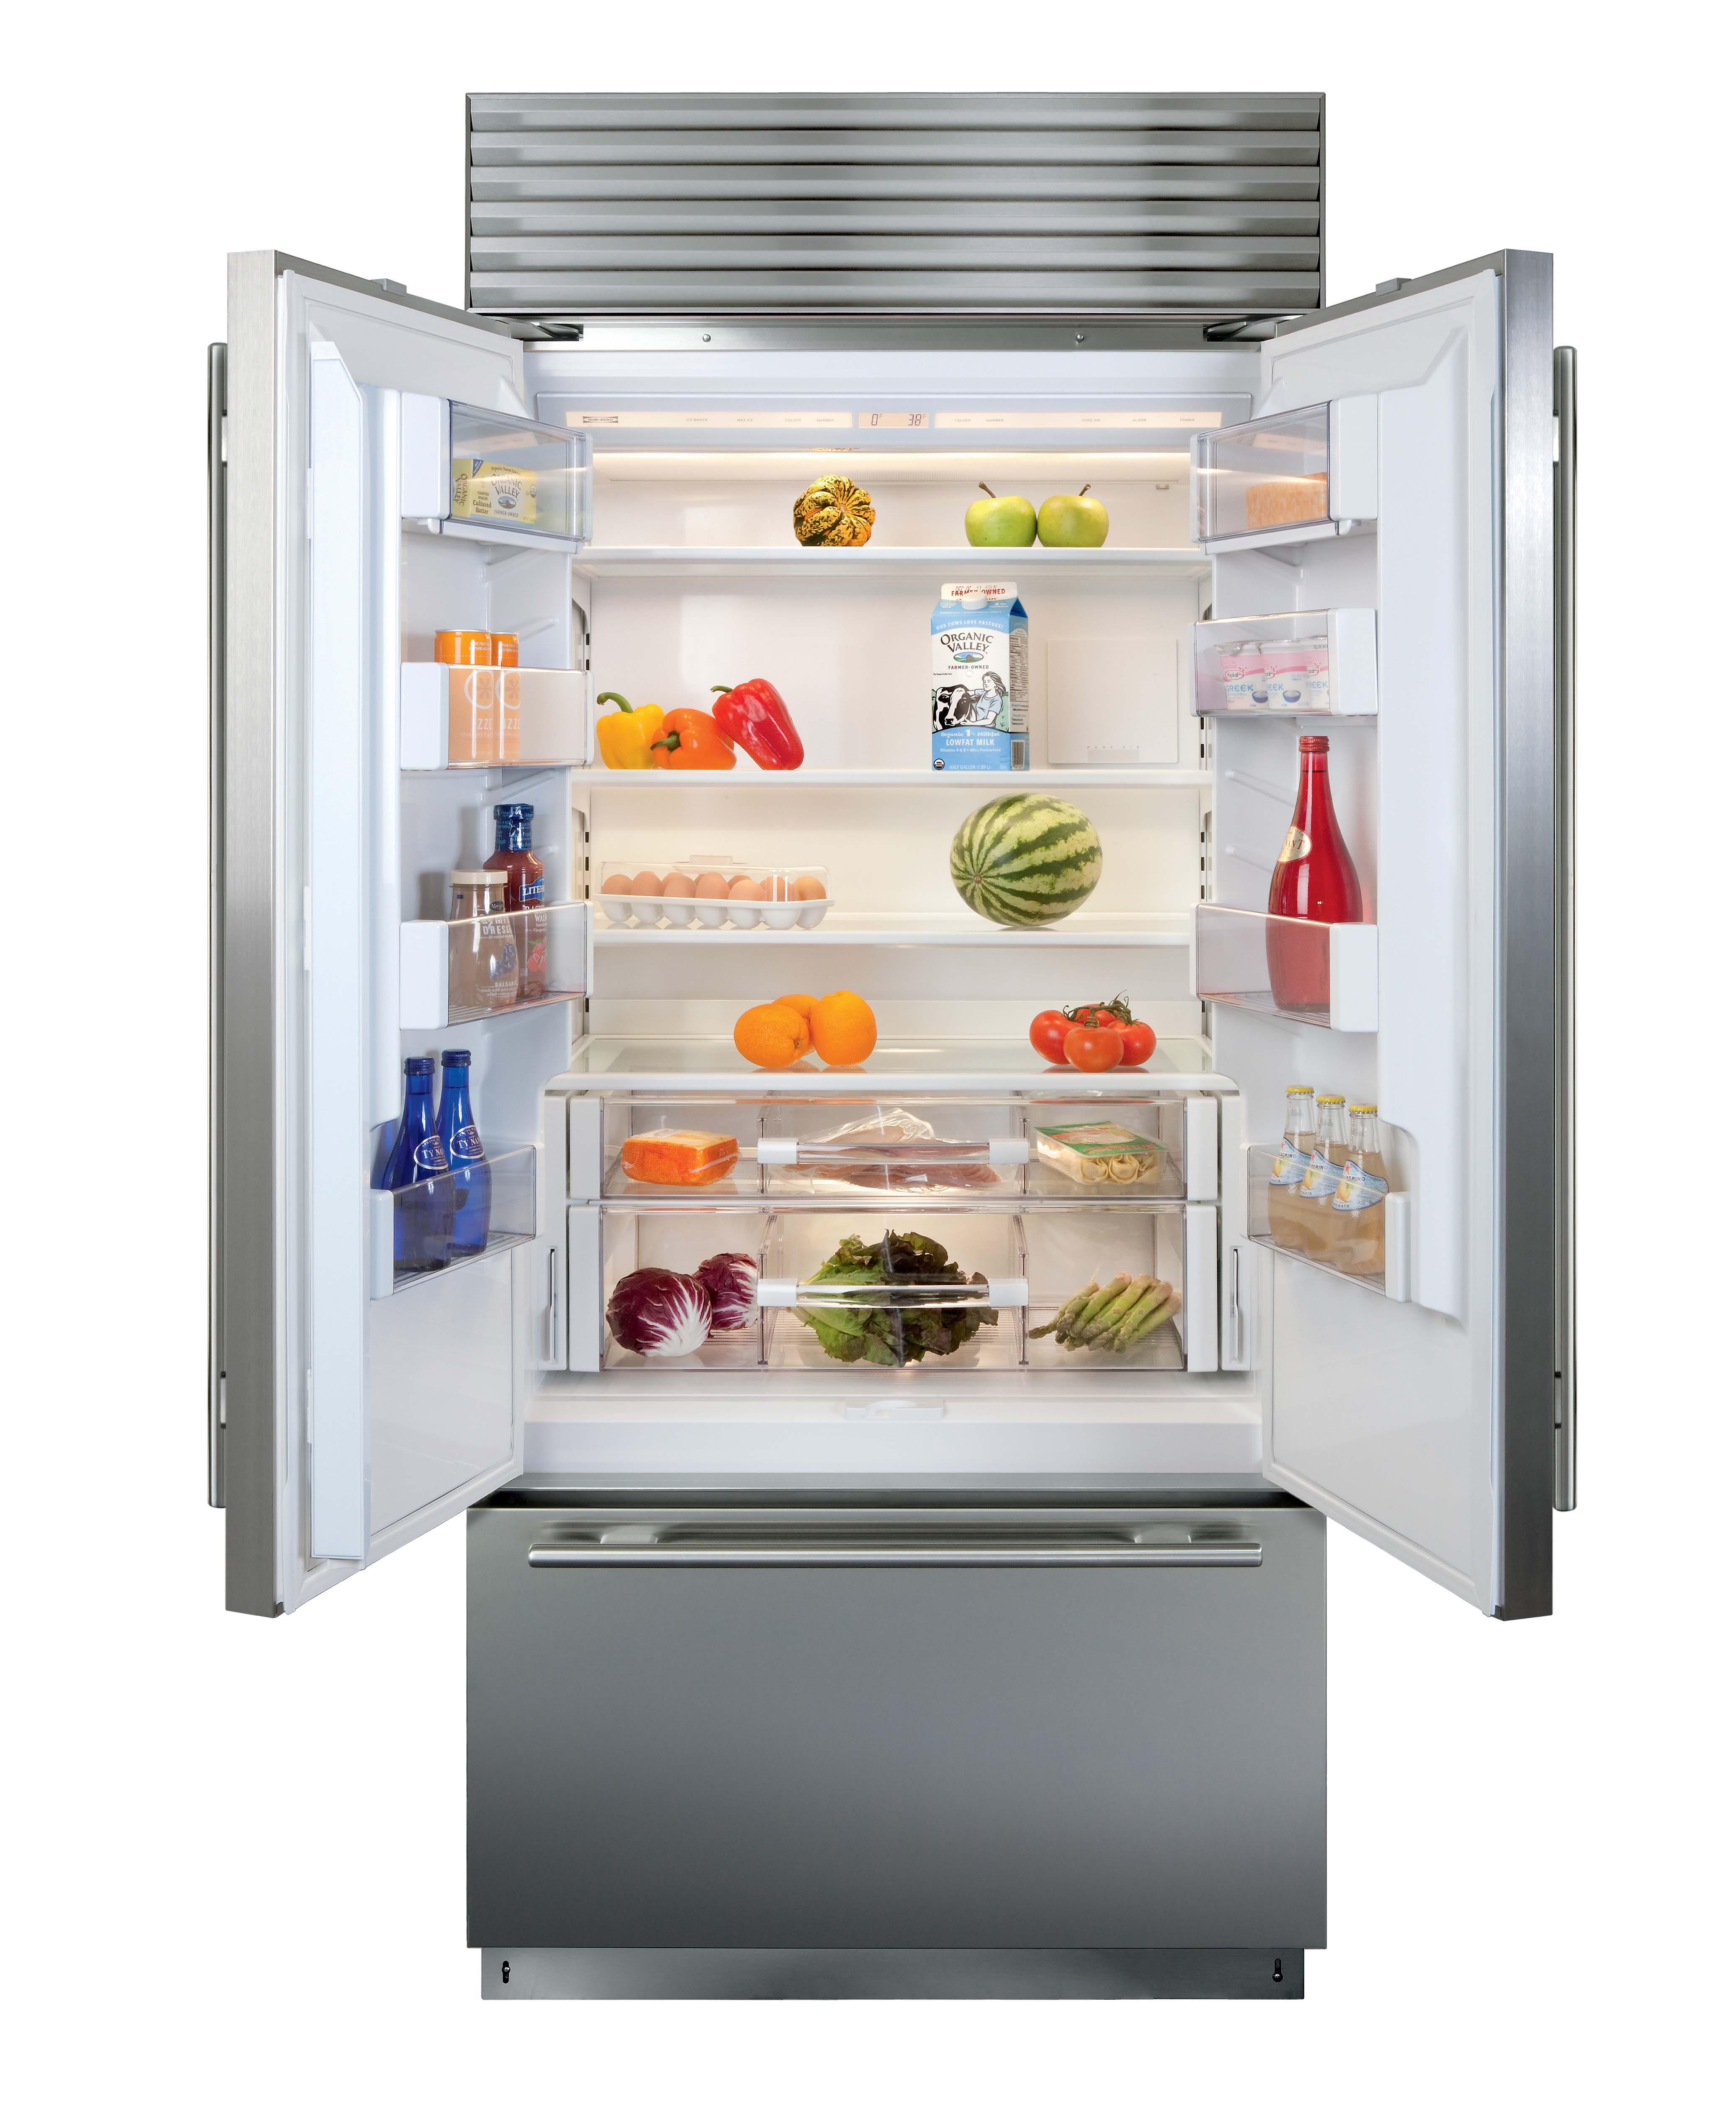 drawers product freezer ready showroom lh built panel in zero all sub model o subzero